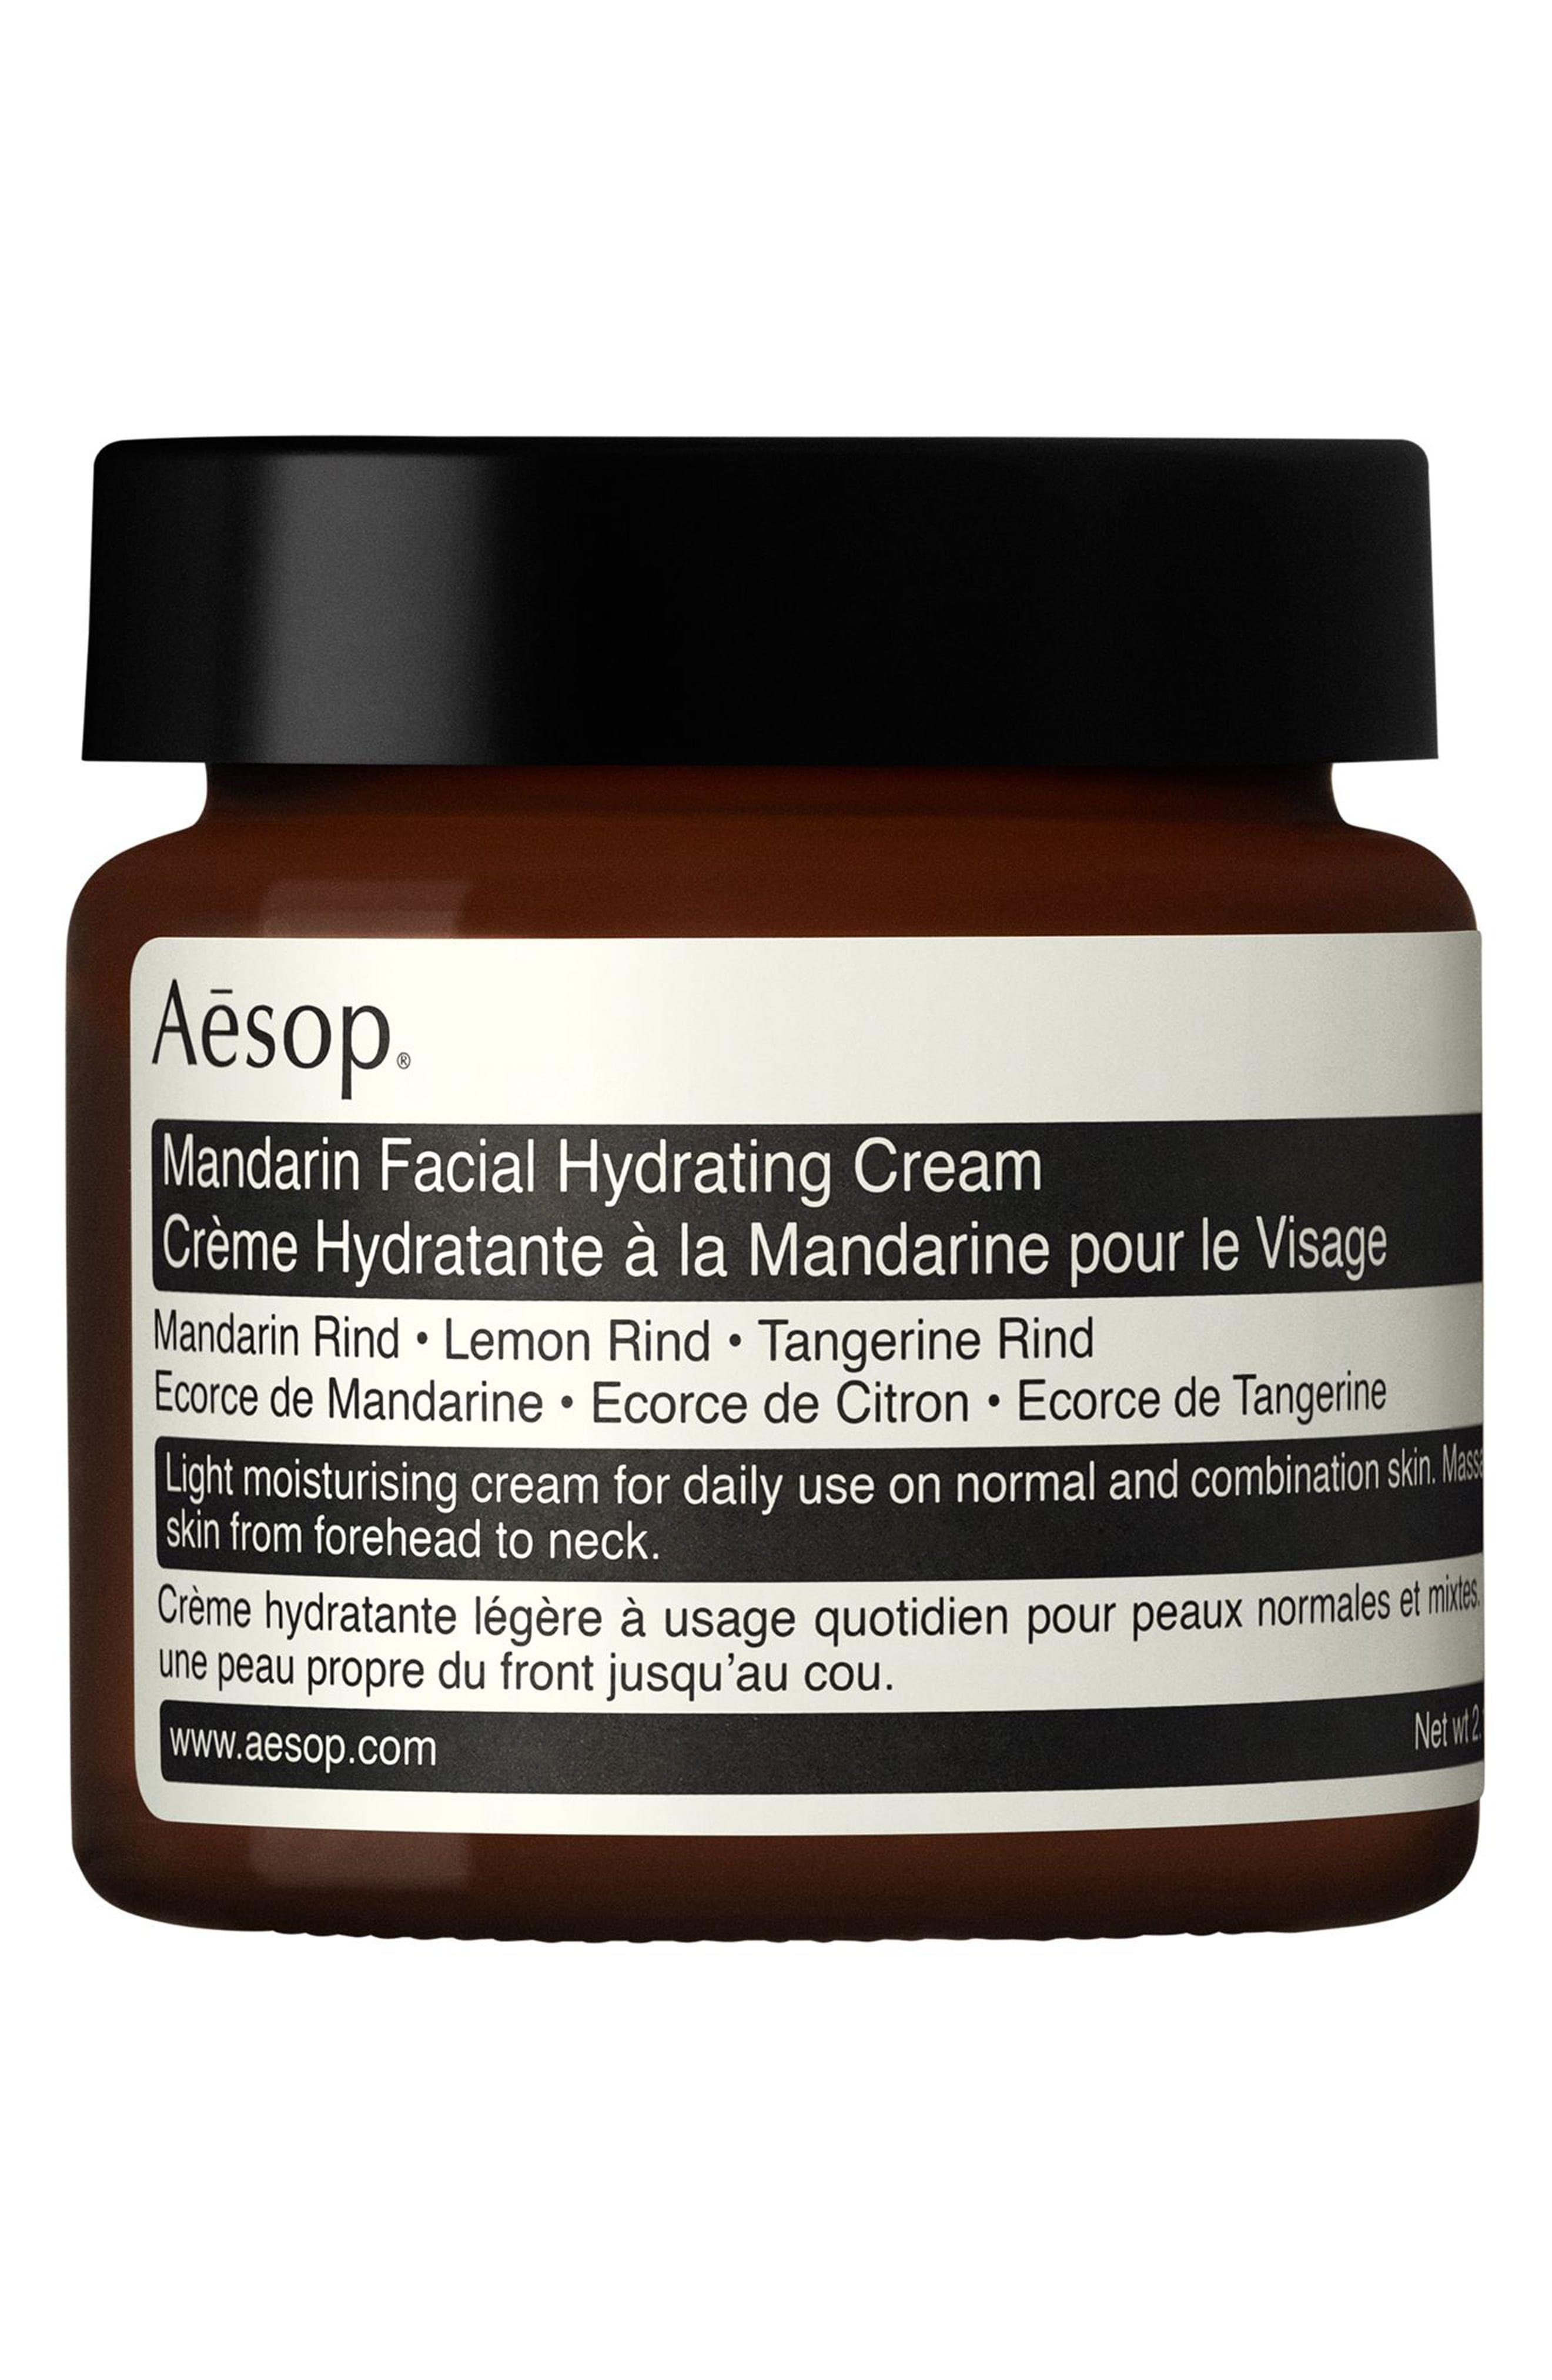 Soothing Face Cream Mandarin Facial Hydrating Cream AESOP nordstrom.com $49.00 SHOP IT